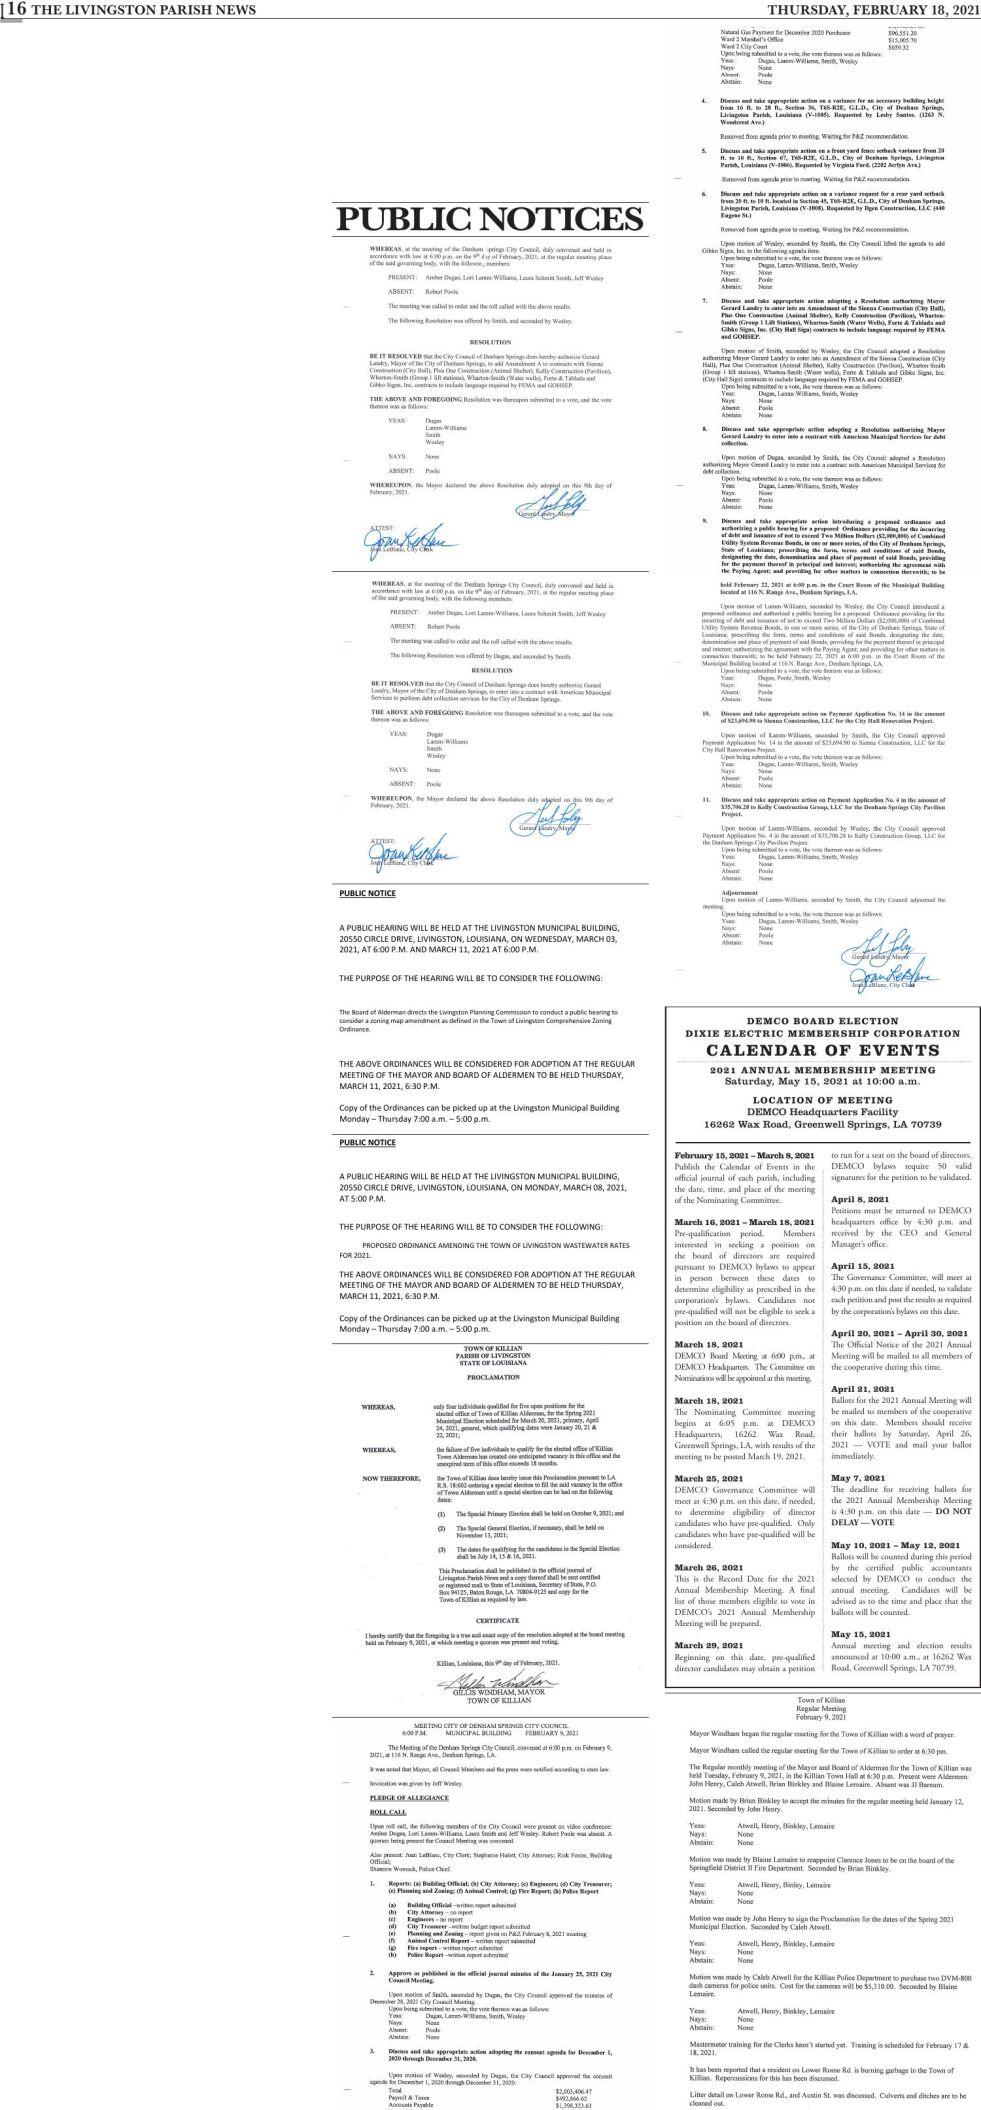 Public Notices published February 18, 2021